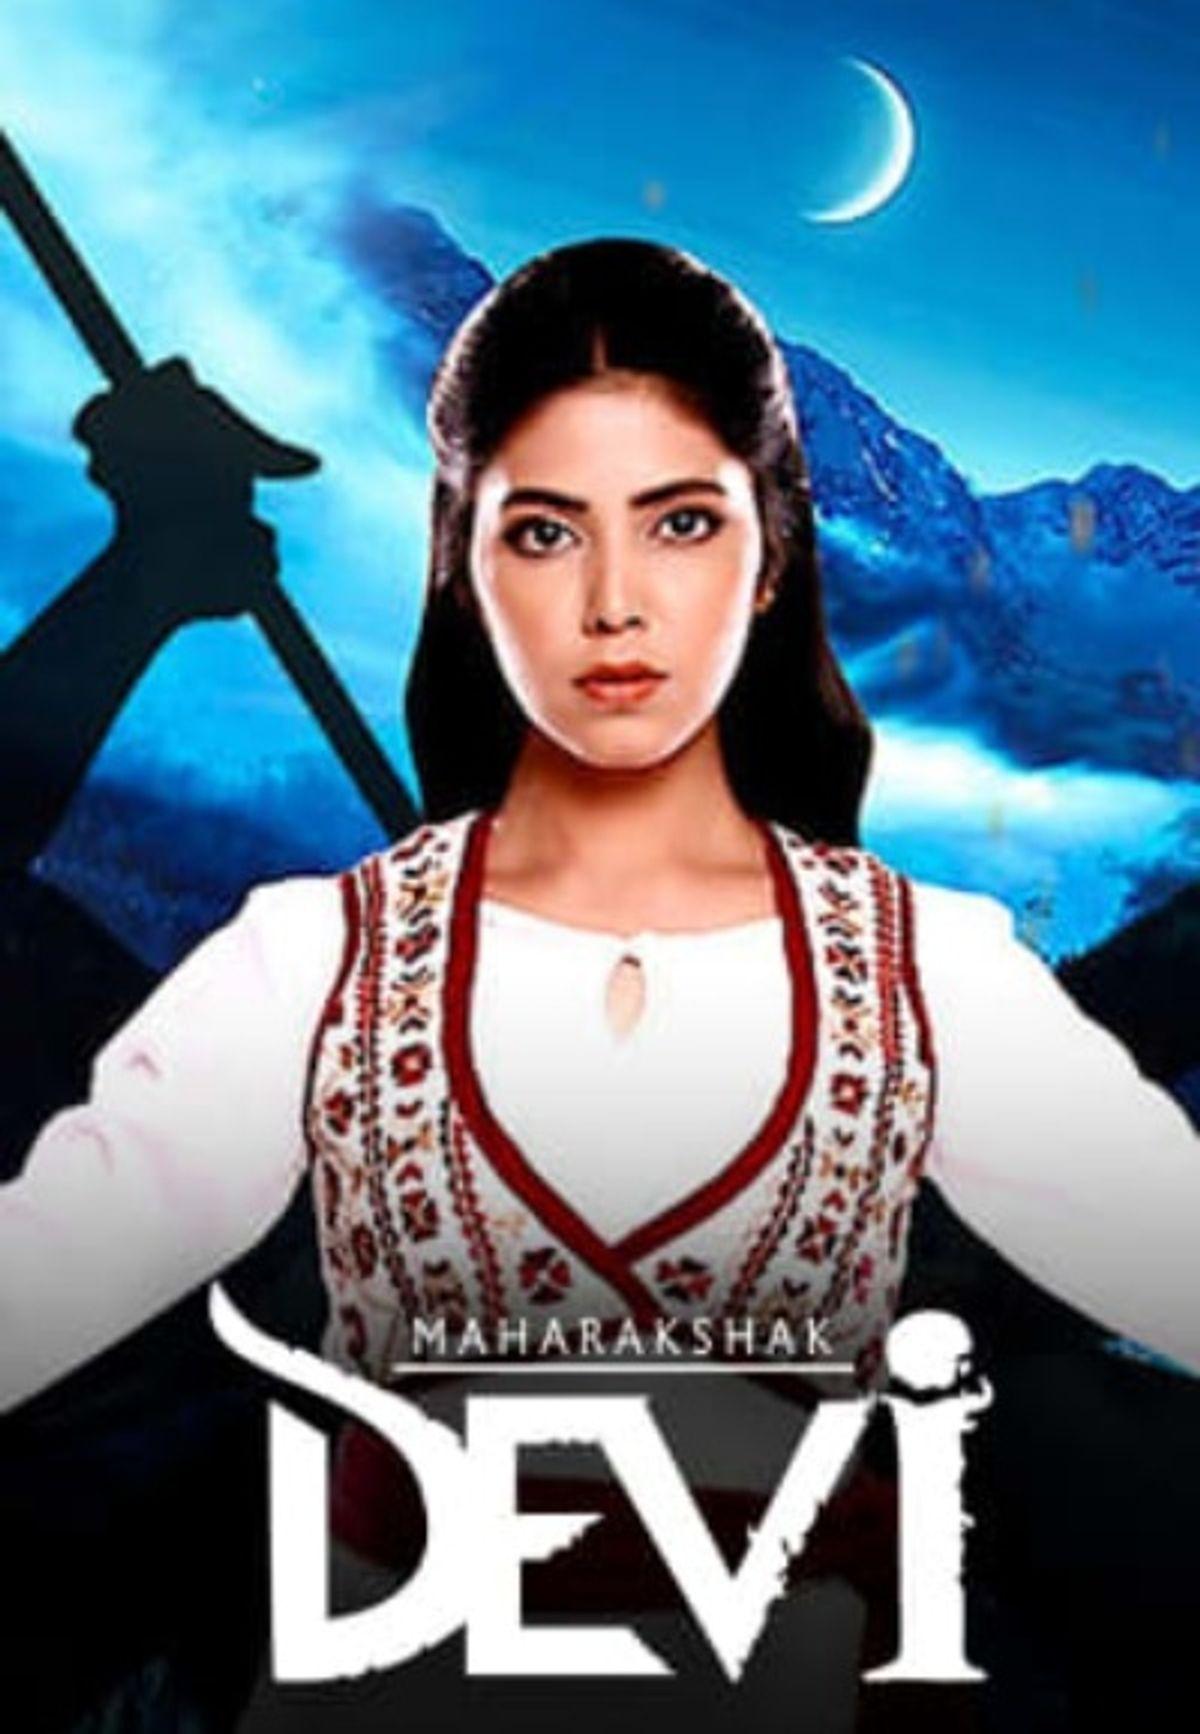 Shresth Kumar Best Movies, TV Shows and Web Series List